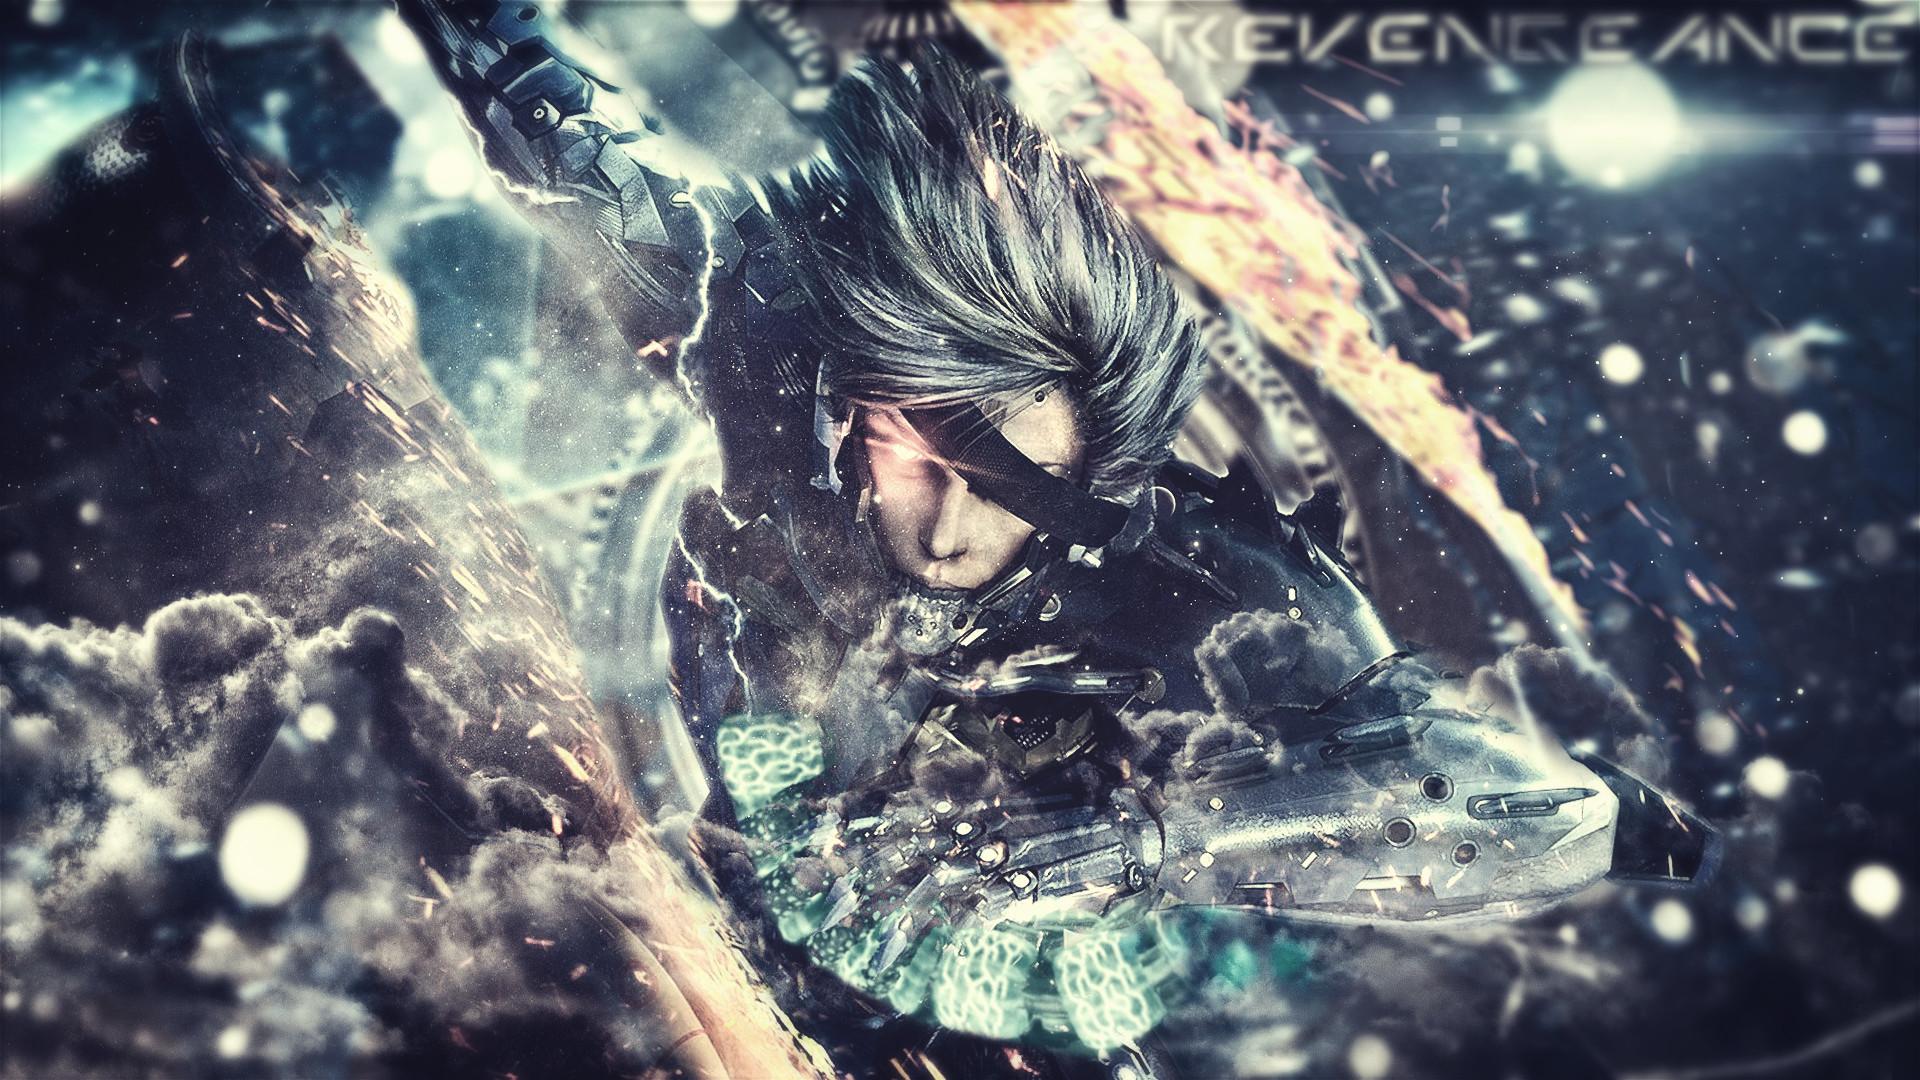 Metal Gear Rising Wallpaper 1920x1080 52573